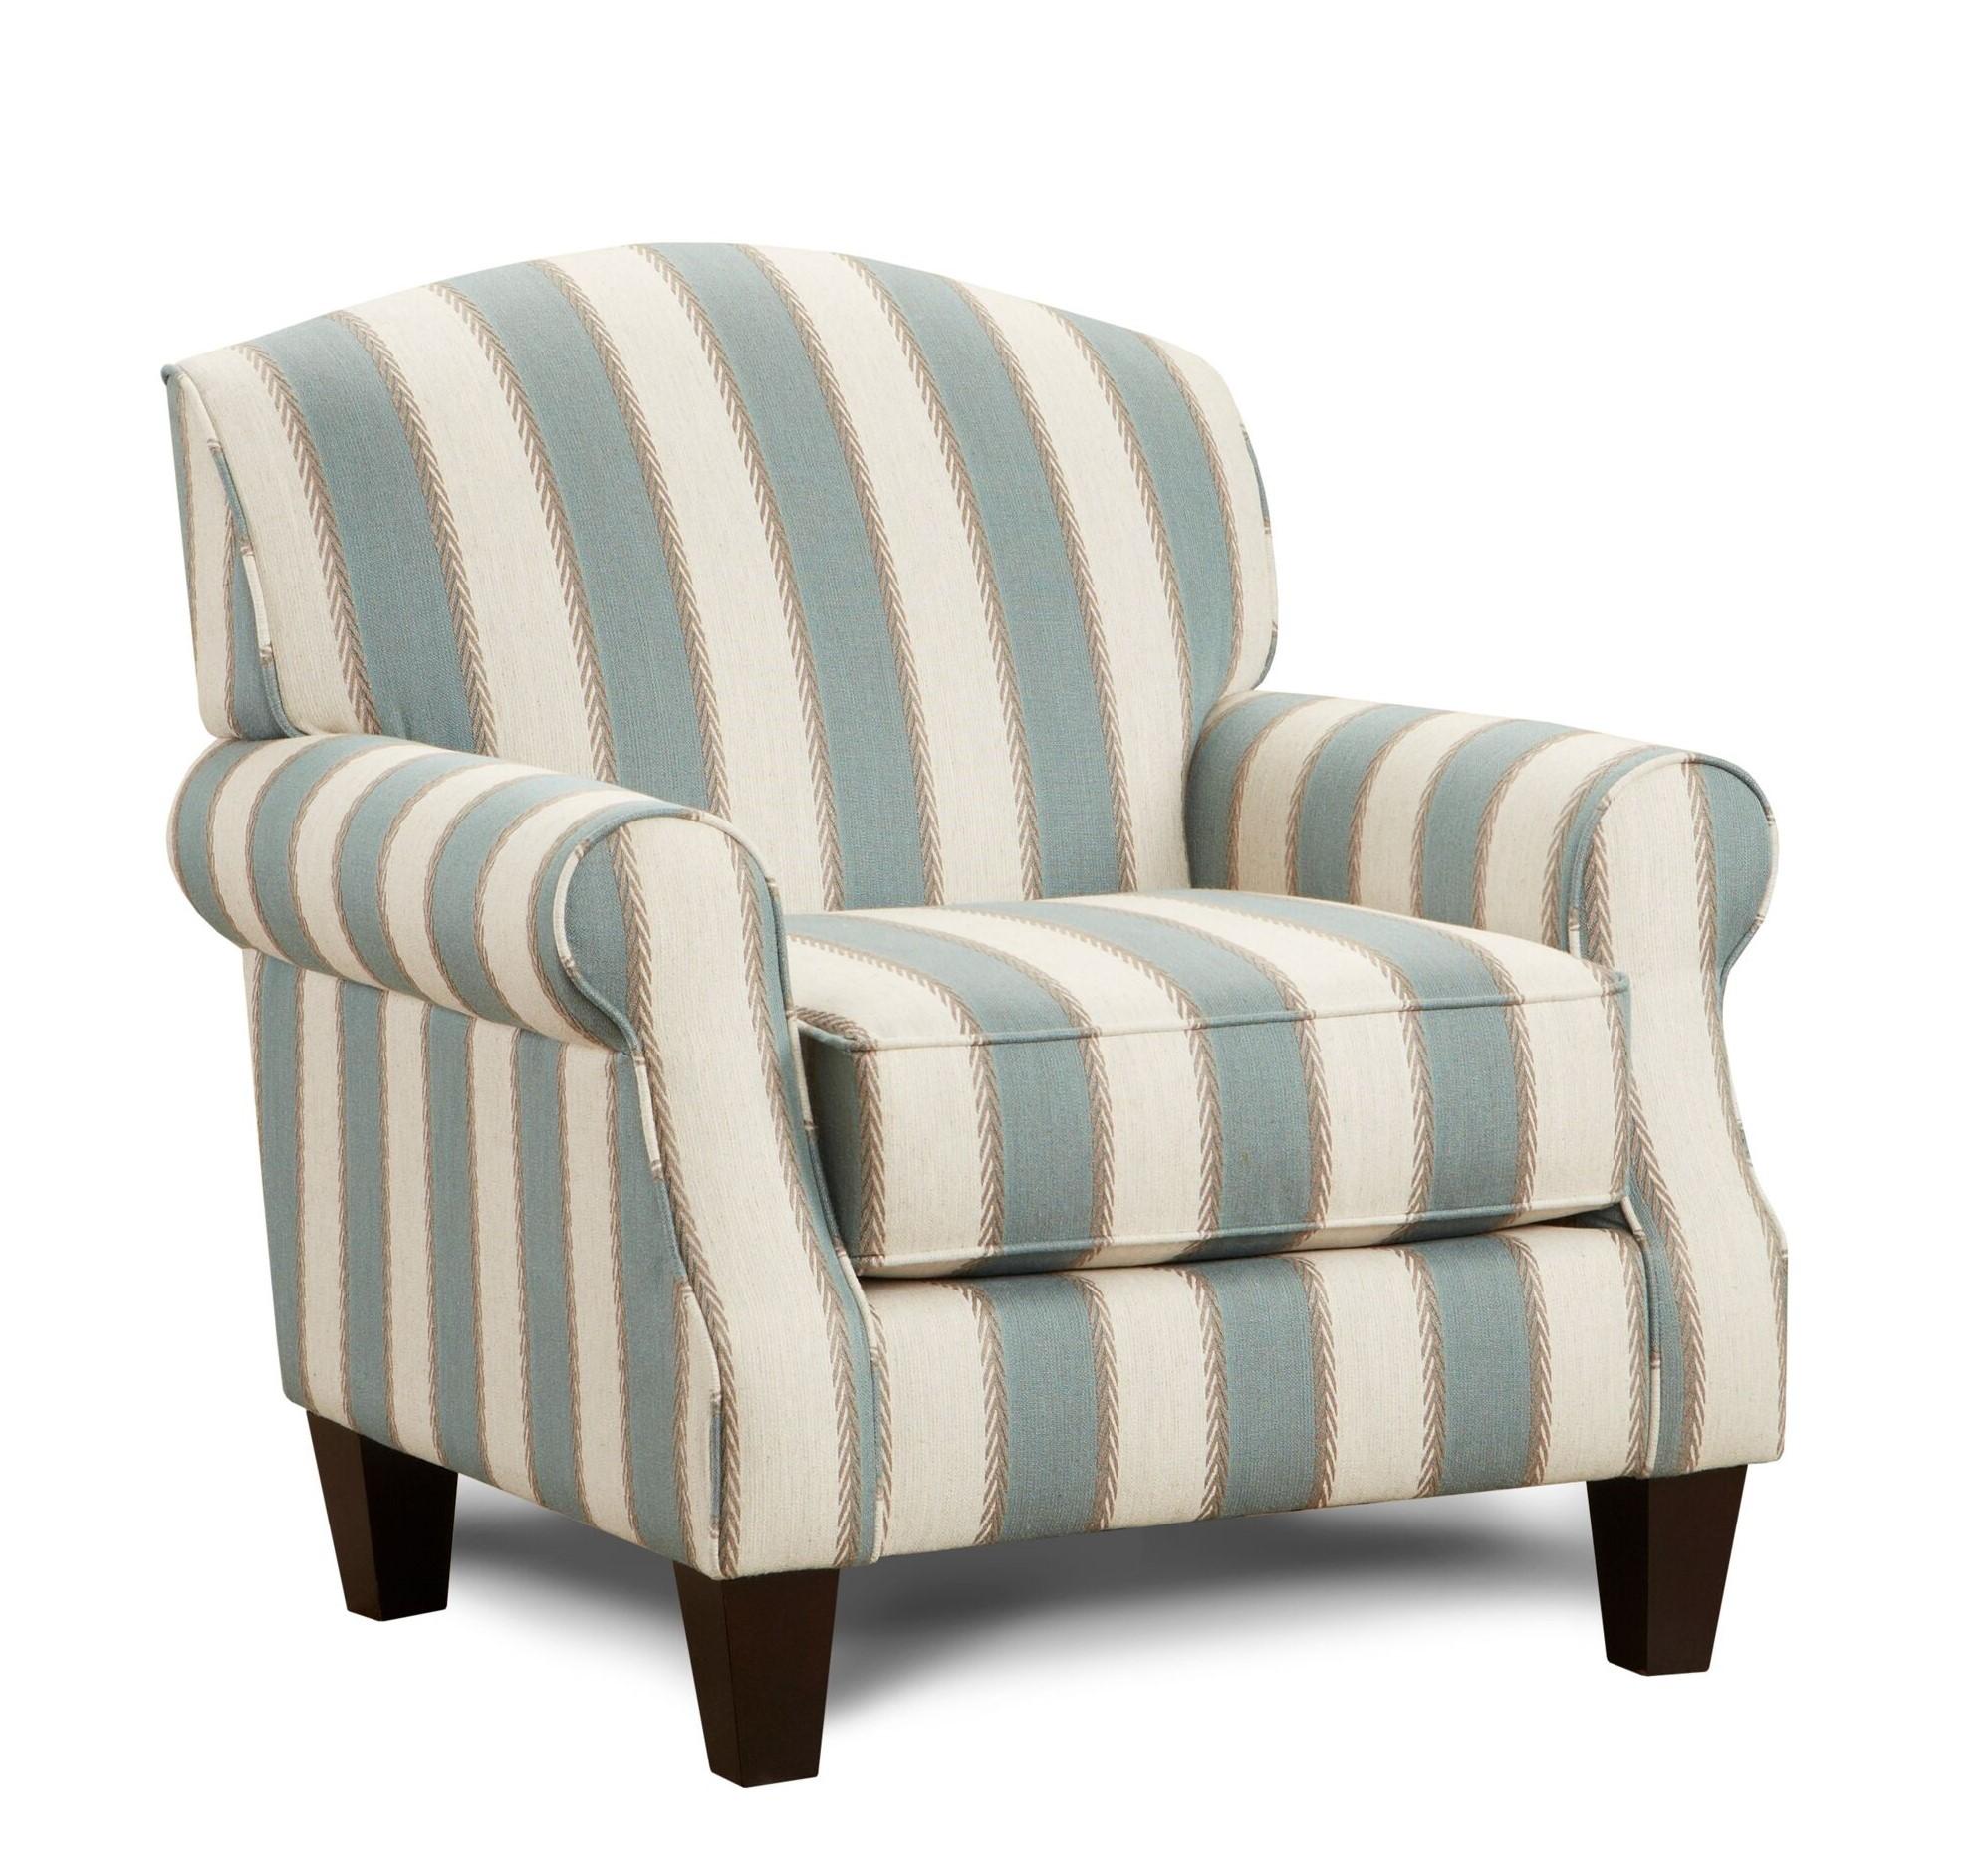 Tulum Spa Accent Chair 854259 Furnitureland